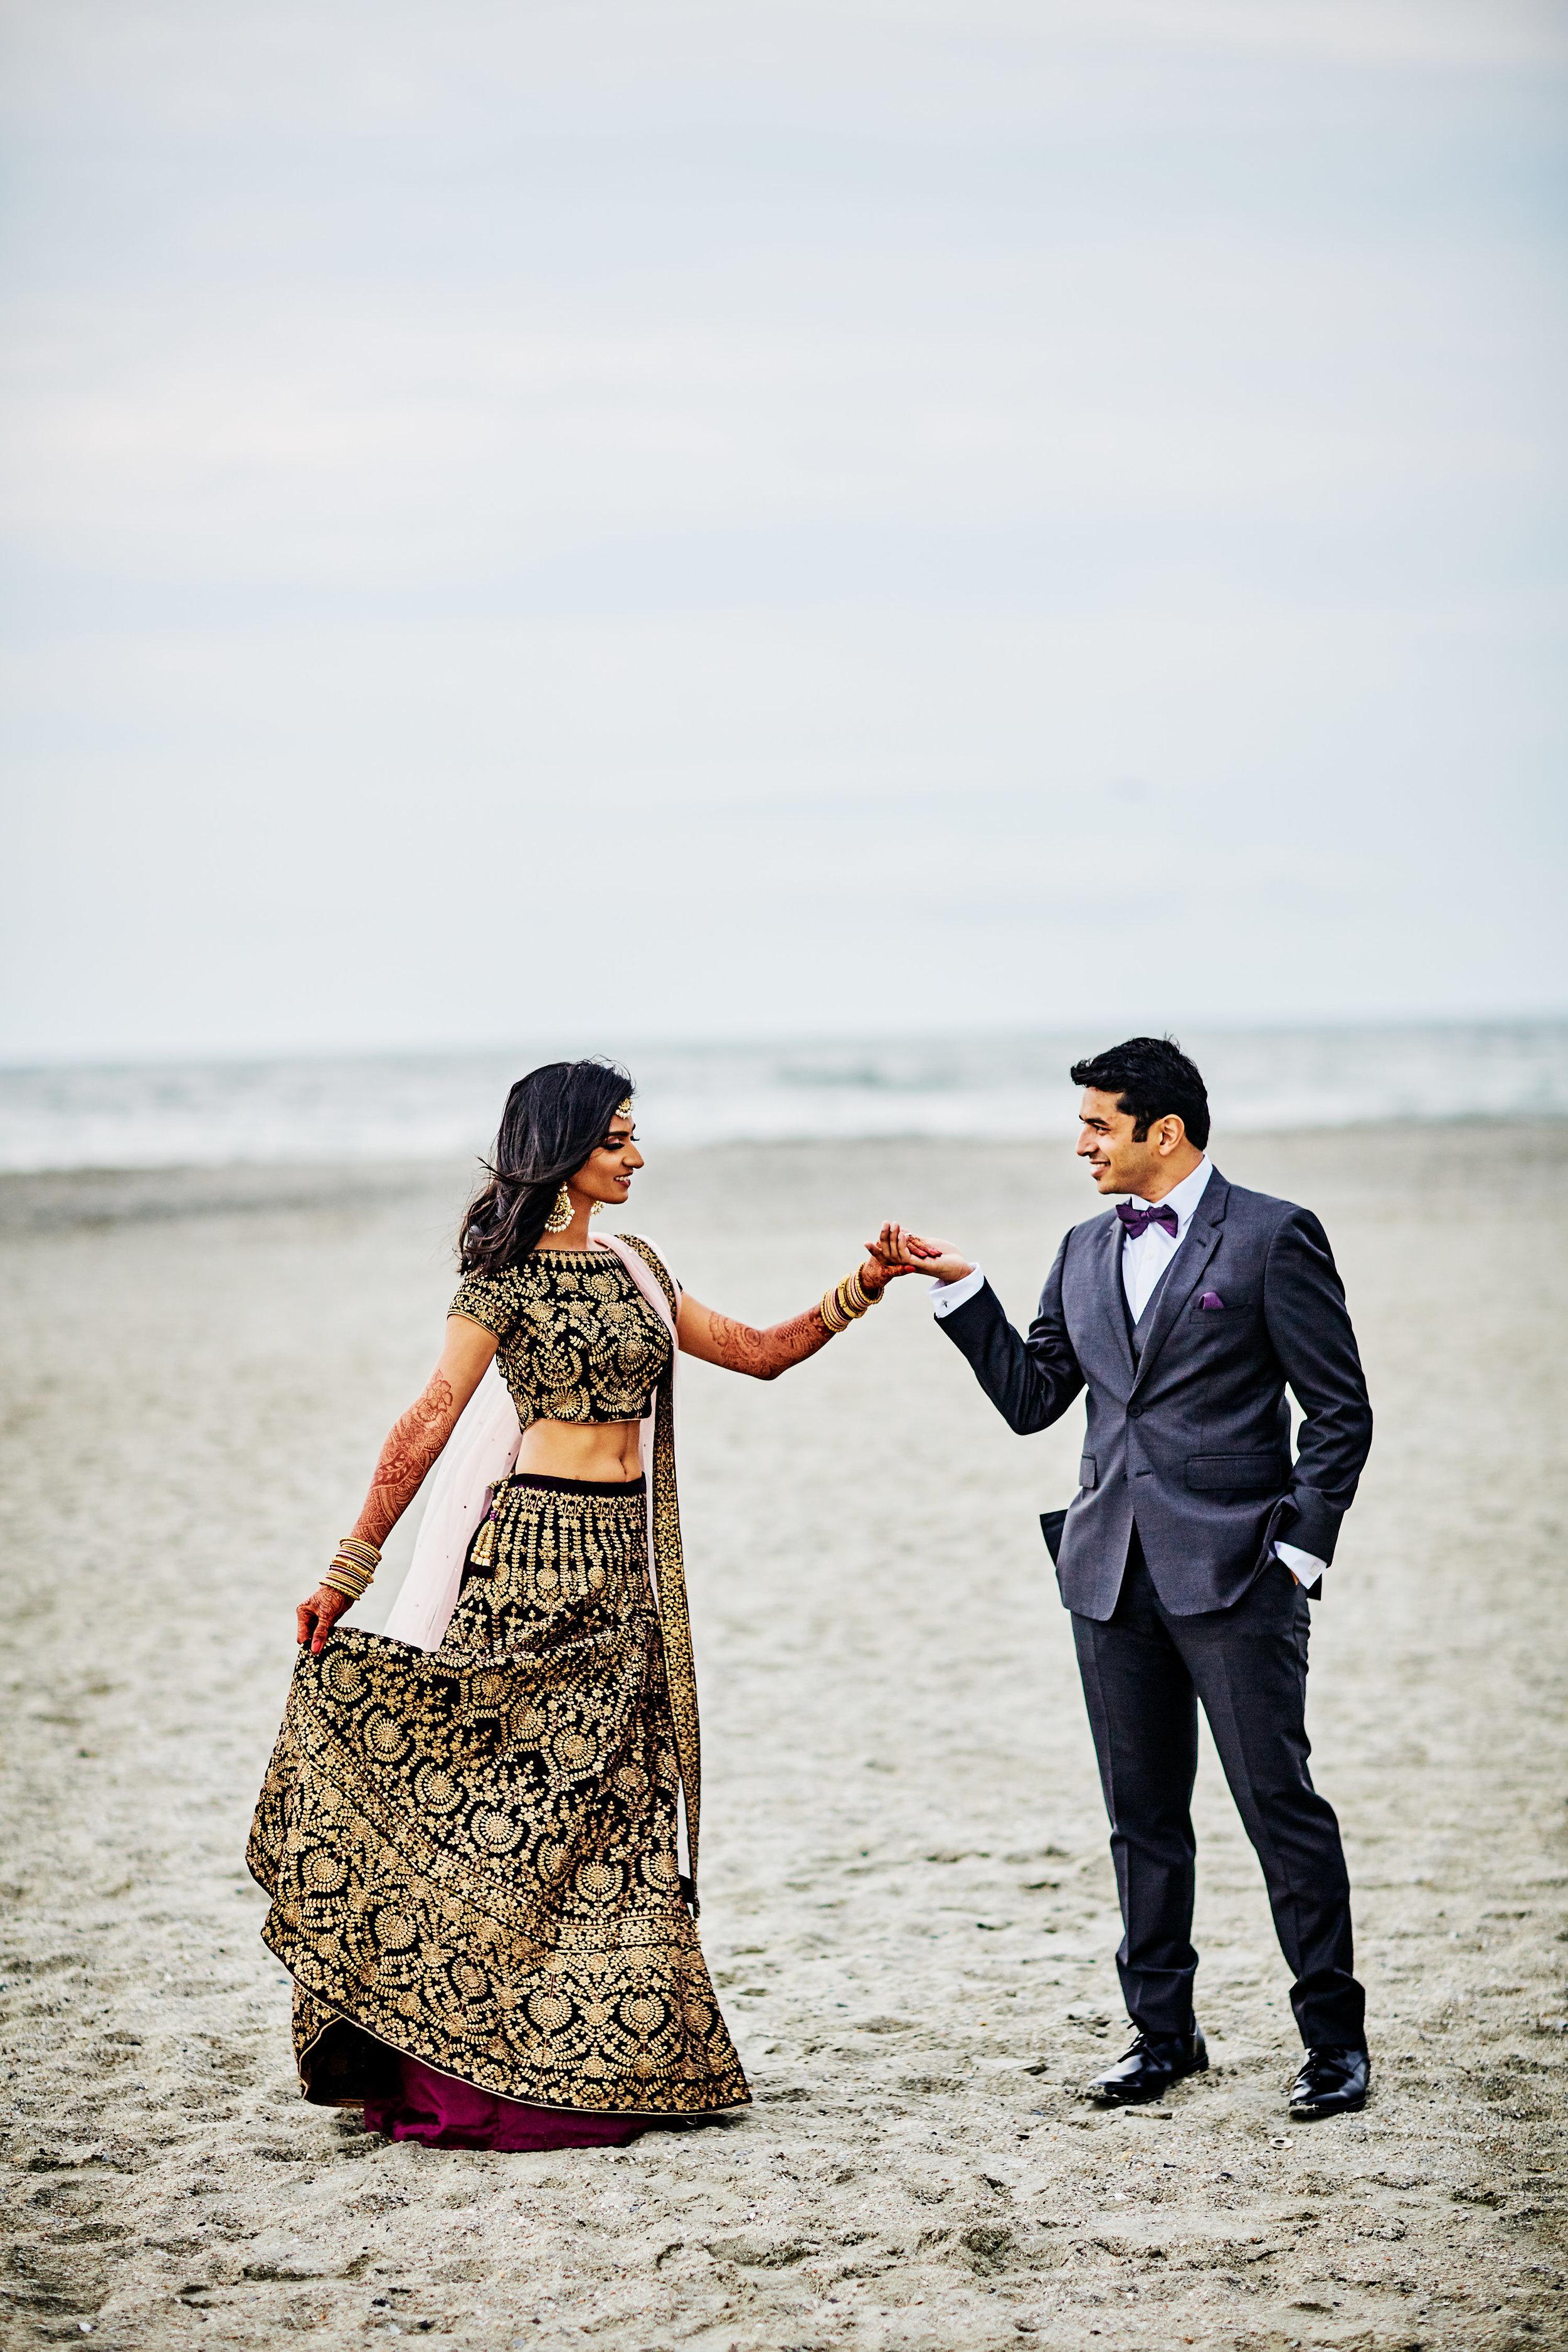 Wild Dunes Wedding Photos by Vitor Lindo _ 515.jpg